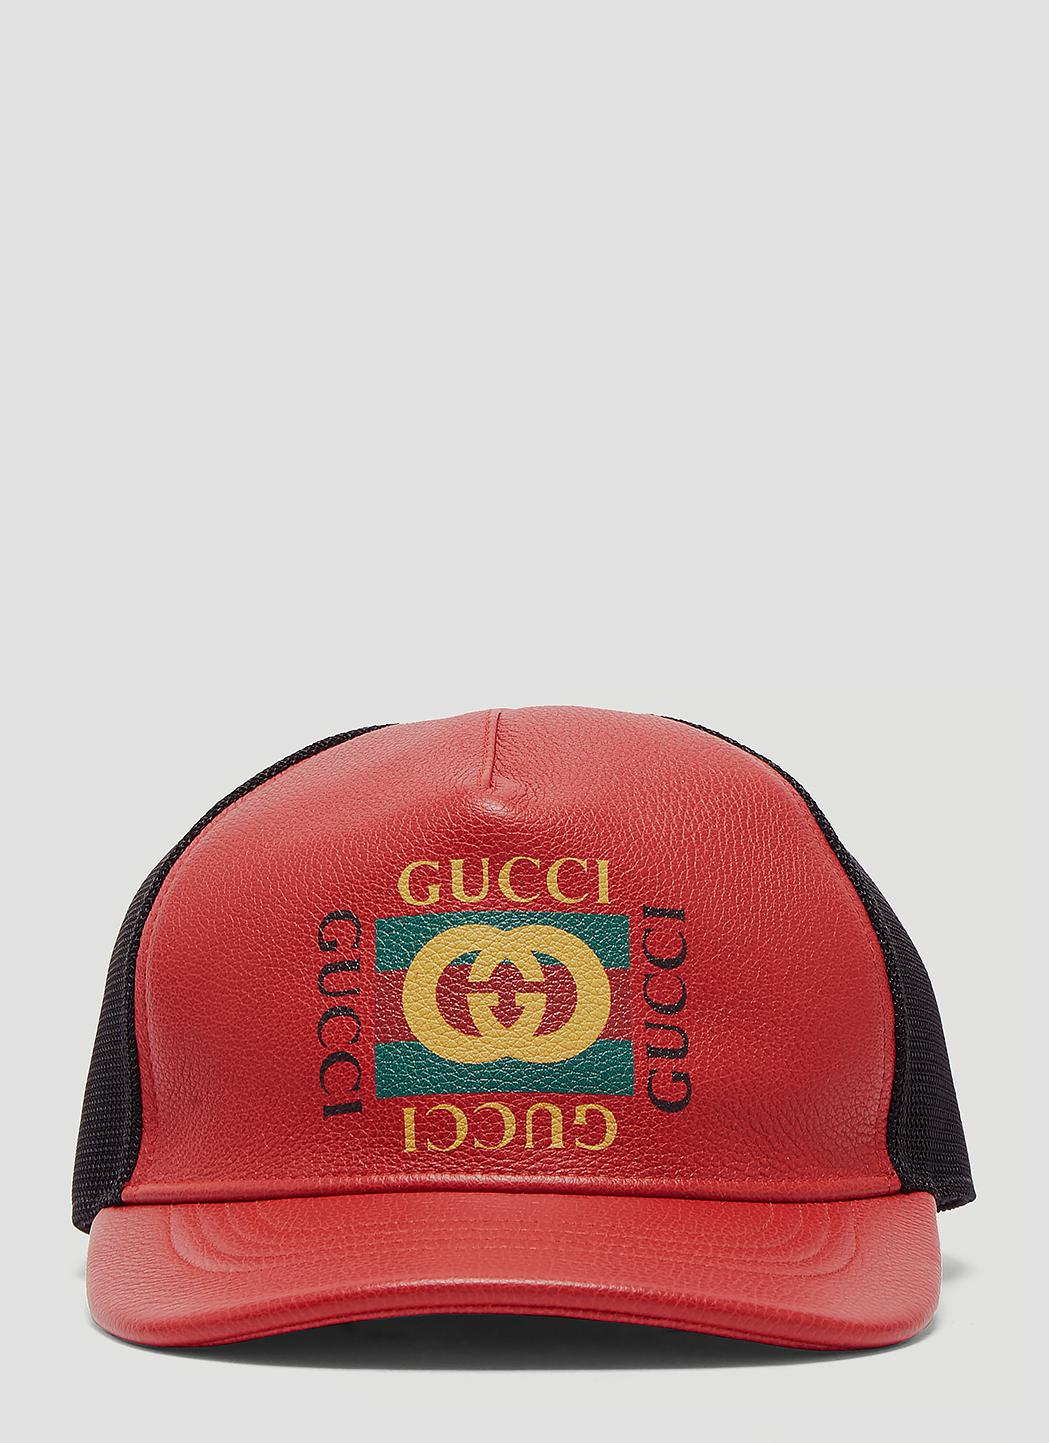 2fc6edbbdb6 Gucci - Red Print Leather Baseball Hat for Men - Lyst. View fullscreen